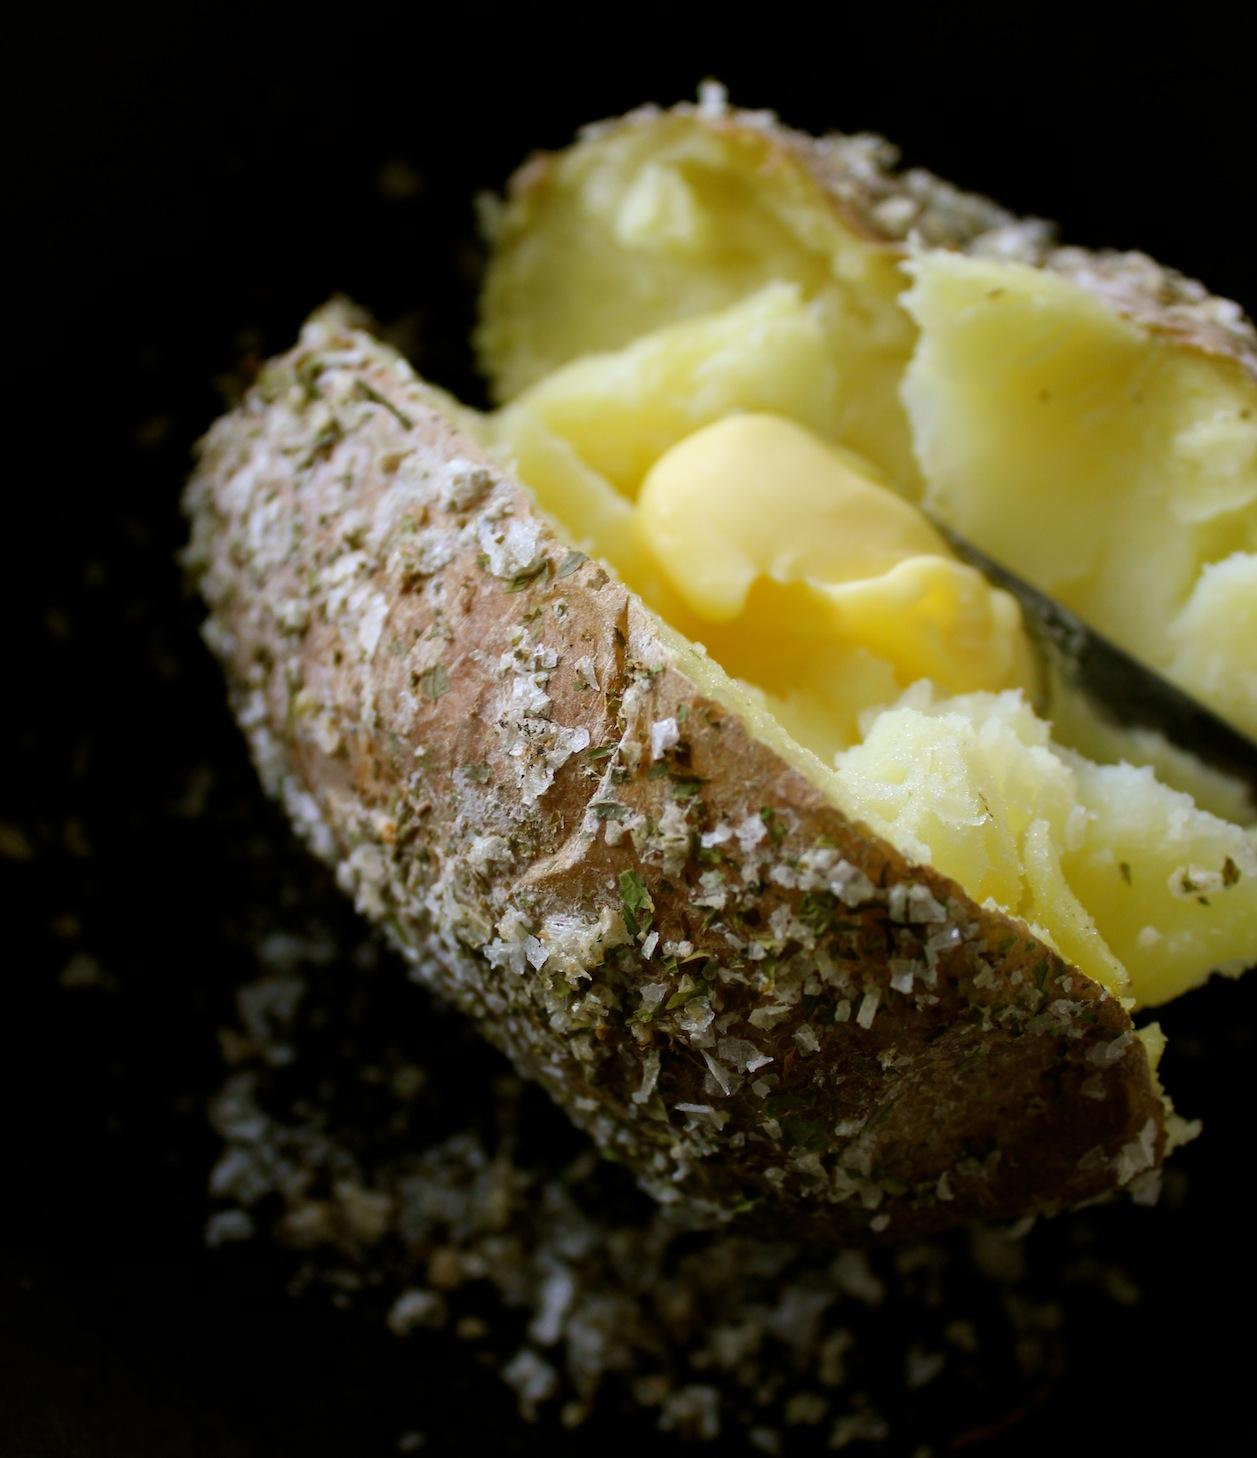 Homemade celery-salt crusted baked potato Recipe on Food52